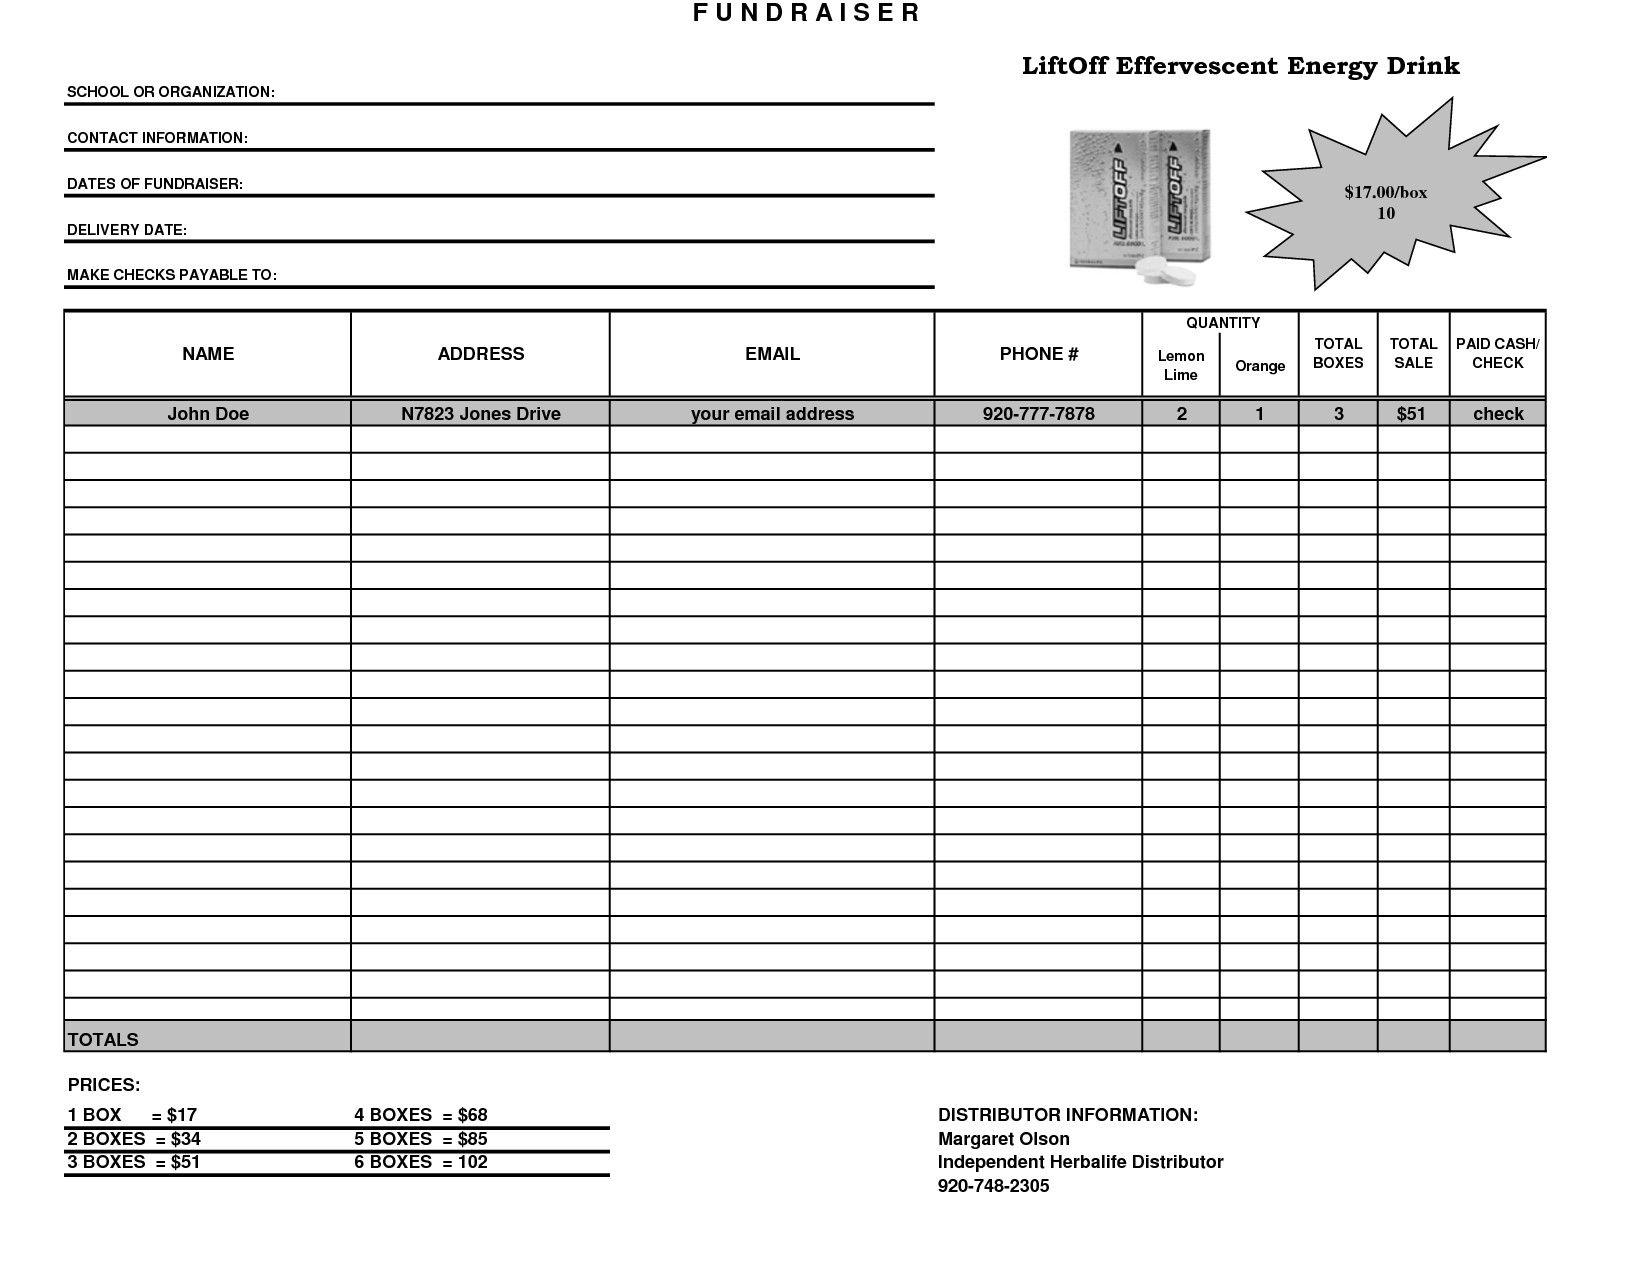 Order form Template Excel Uptodate Fundraiser Template